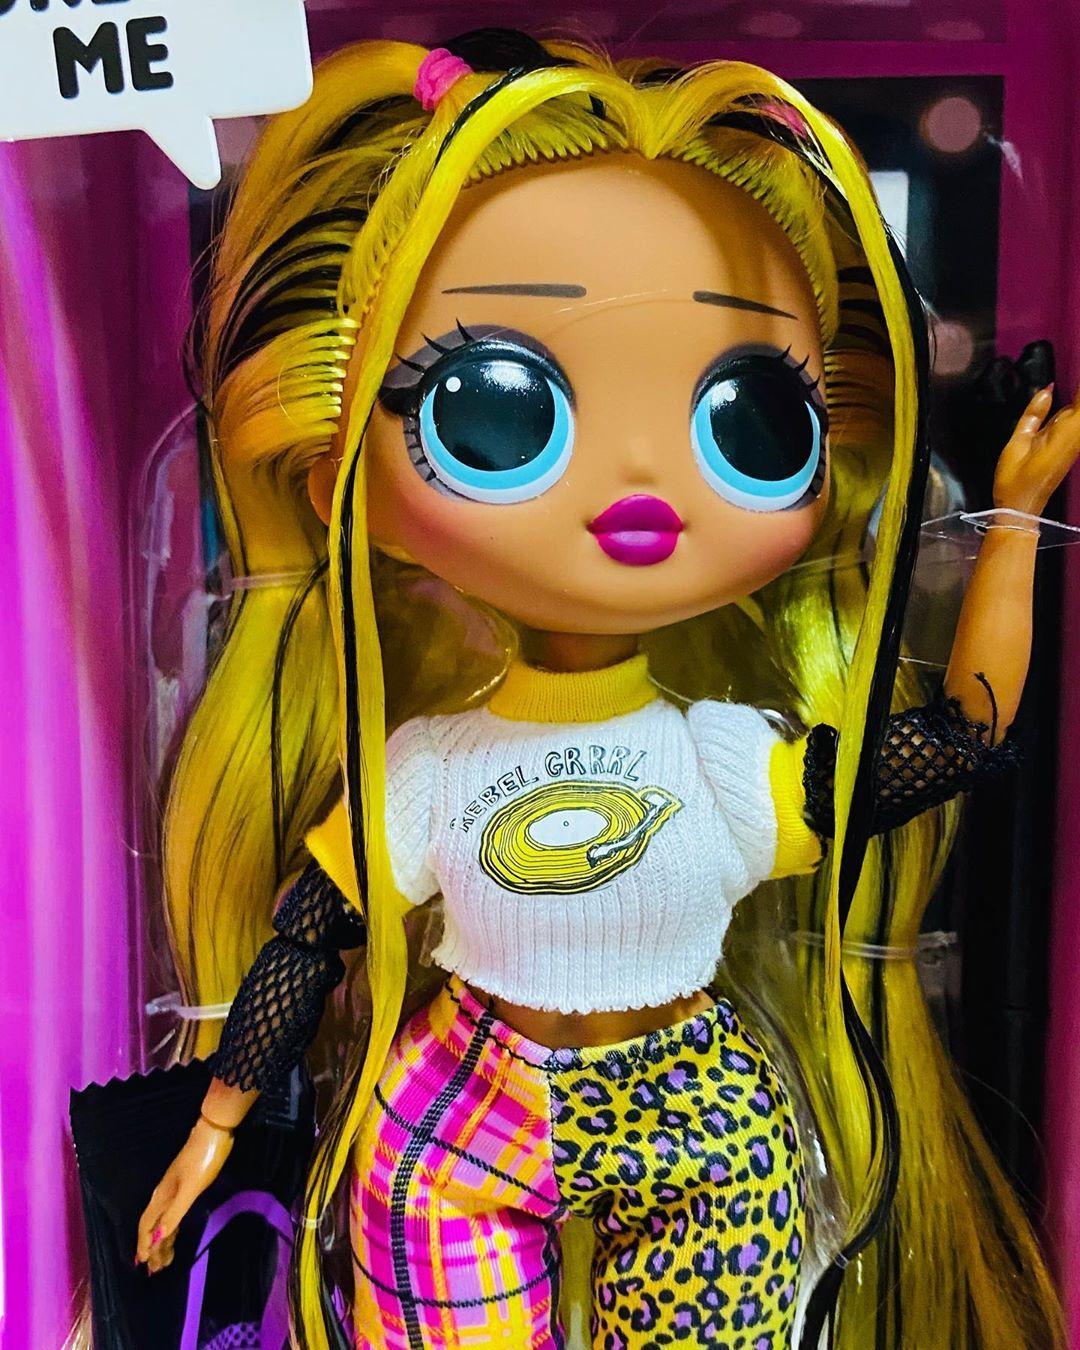 Pin By Jasmine Chism On Swag Lol Dolls Sister Dolls Lol